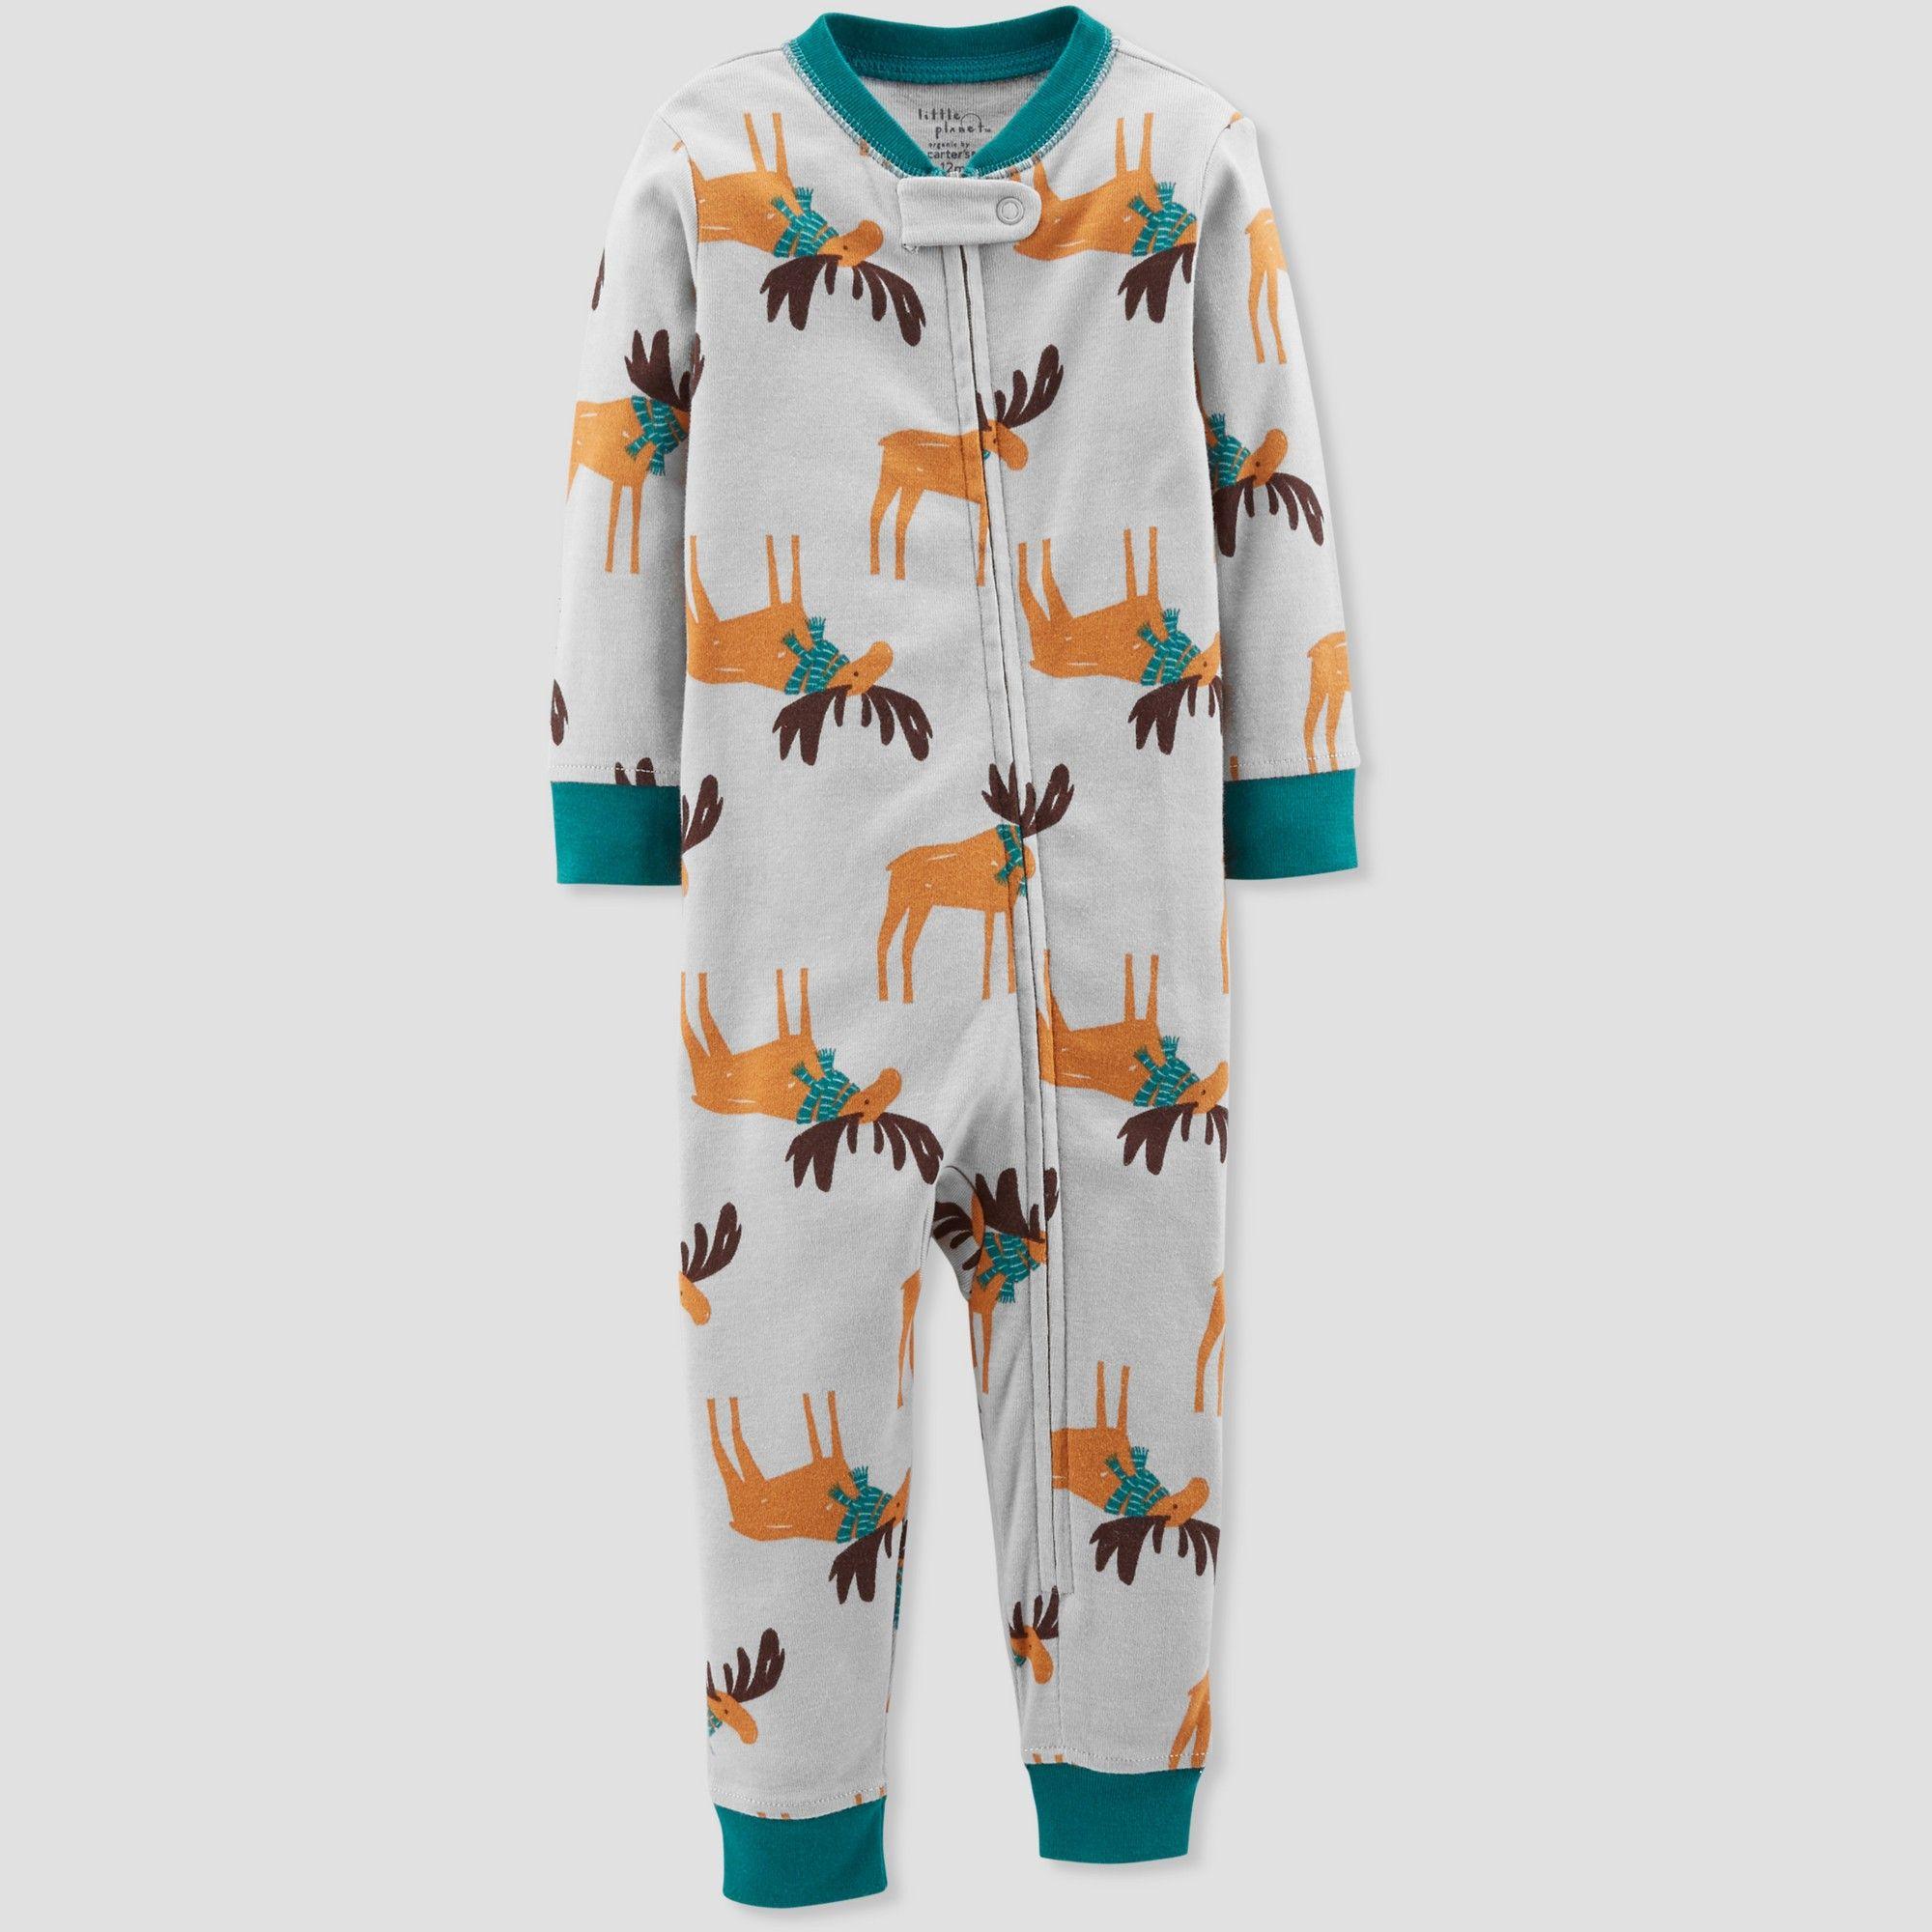 NWT Carter/'s Baby Boy Girl Christmas Fleece Footed Sleeper Pajamas 5T